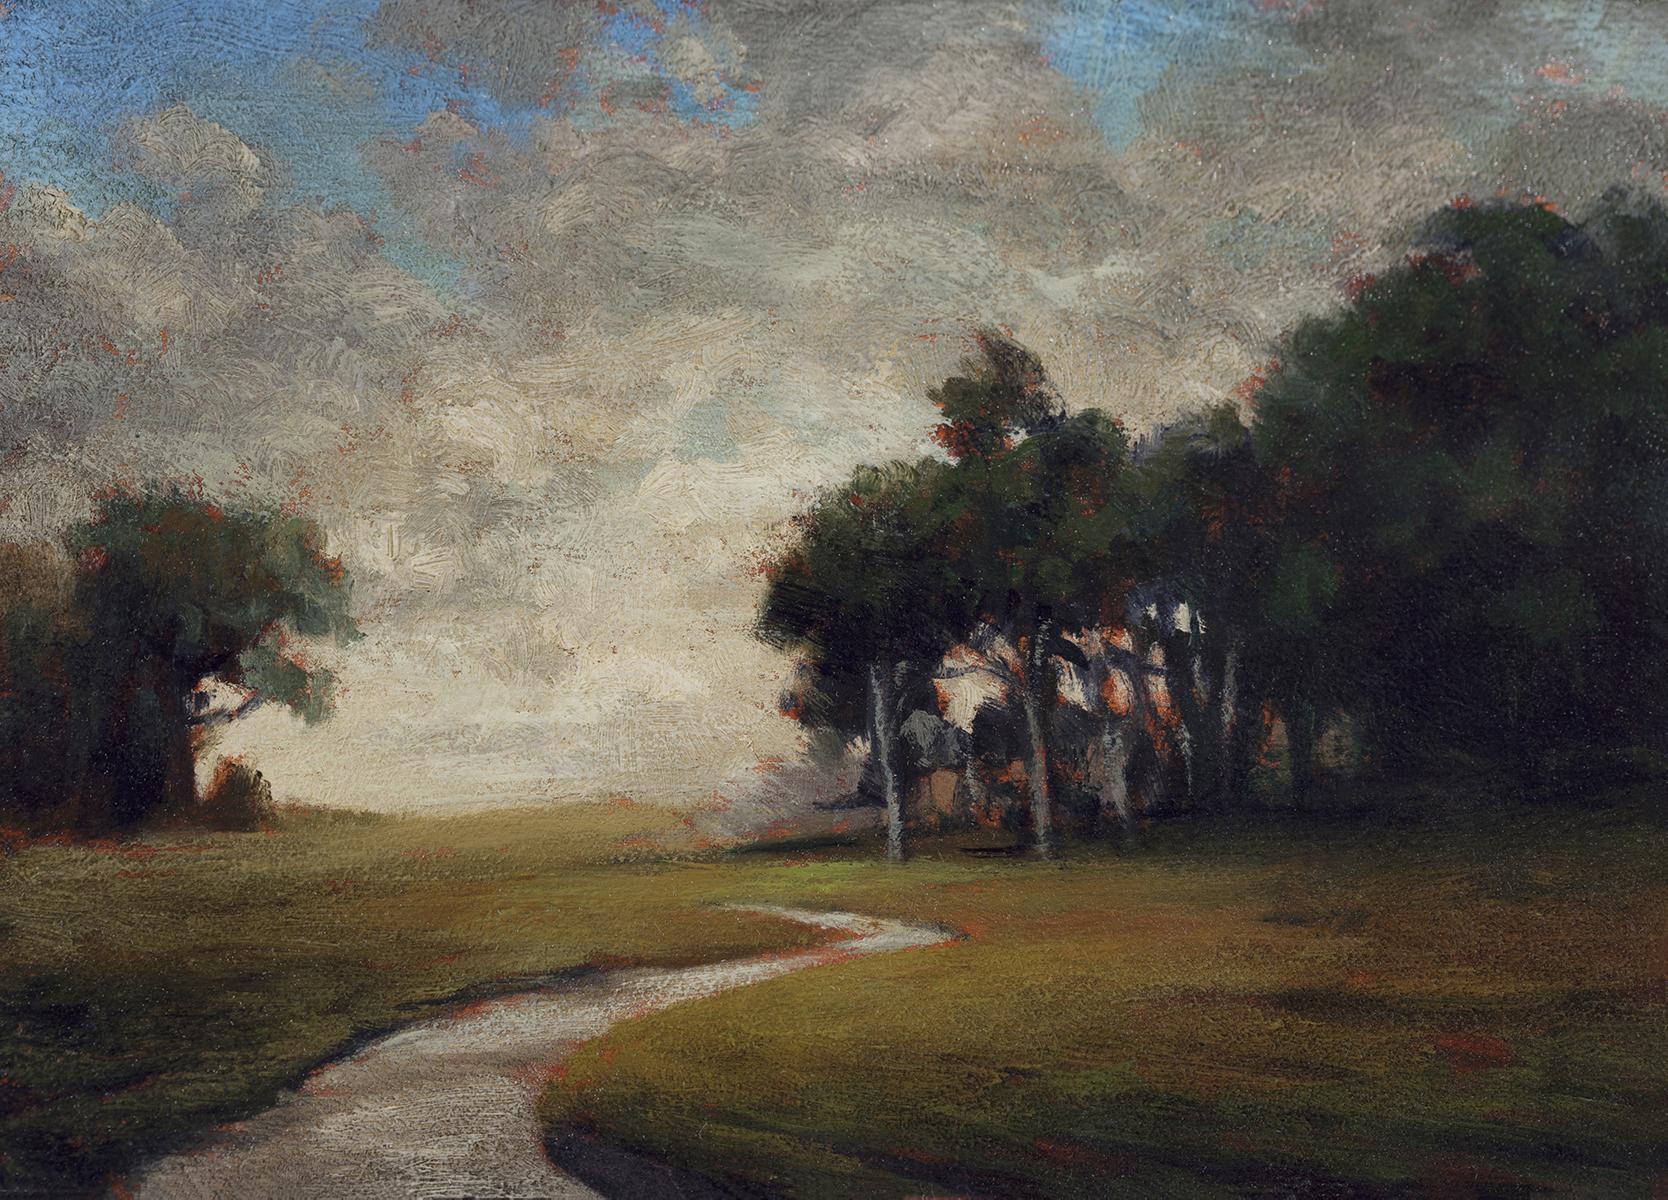 Hillside Stream by M Francis McCarthy - 5x7 Oil on Wood Panel